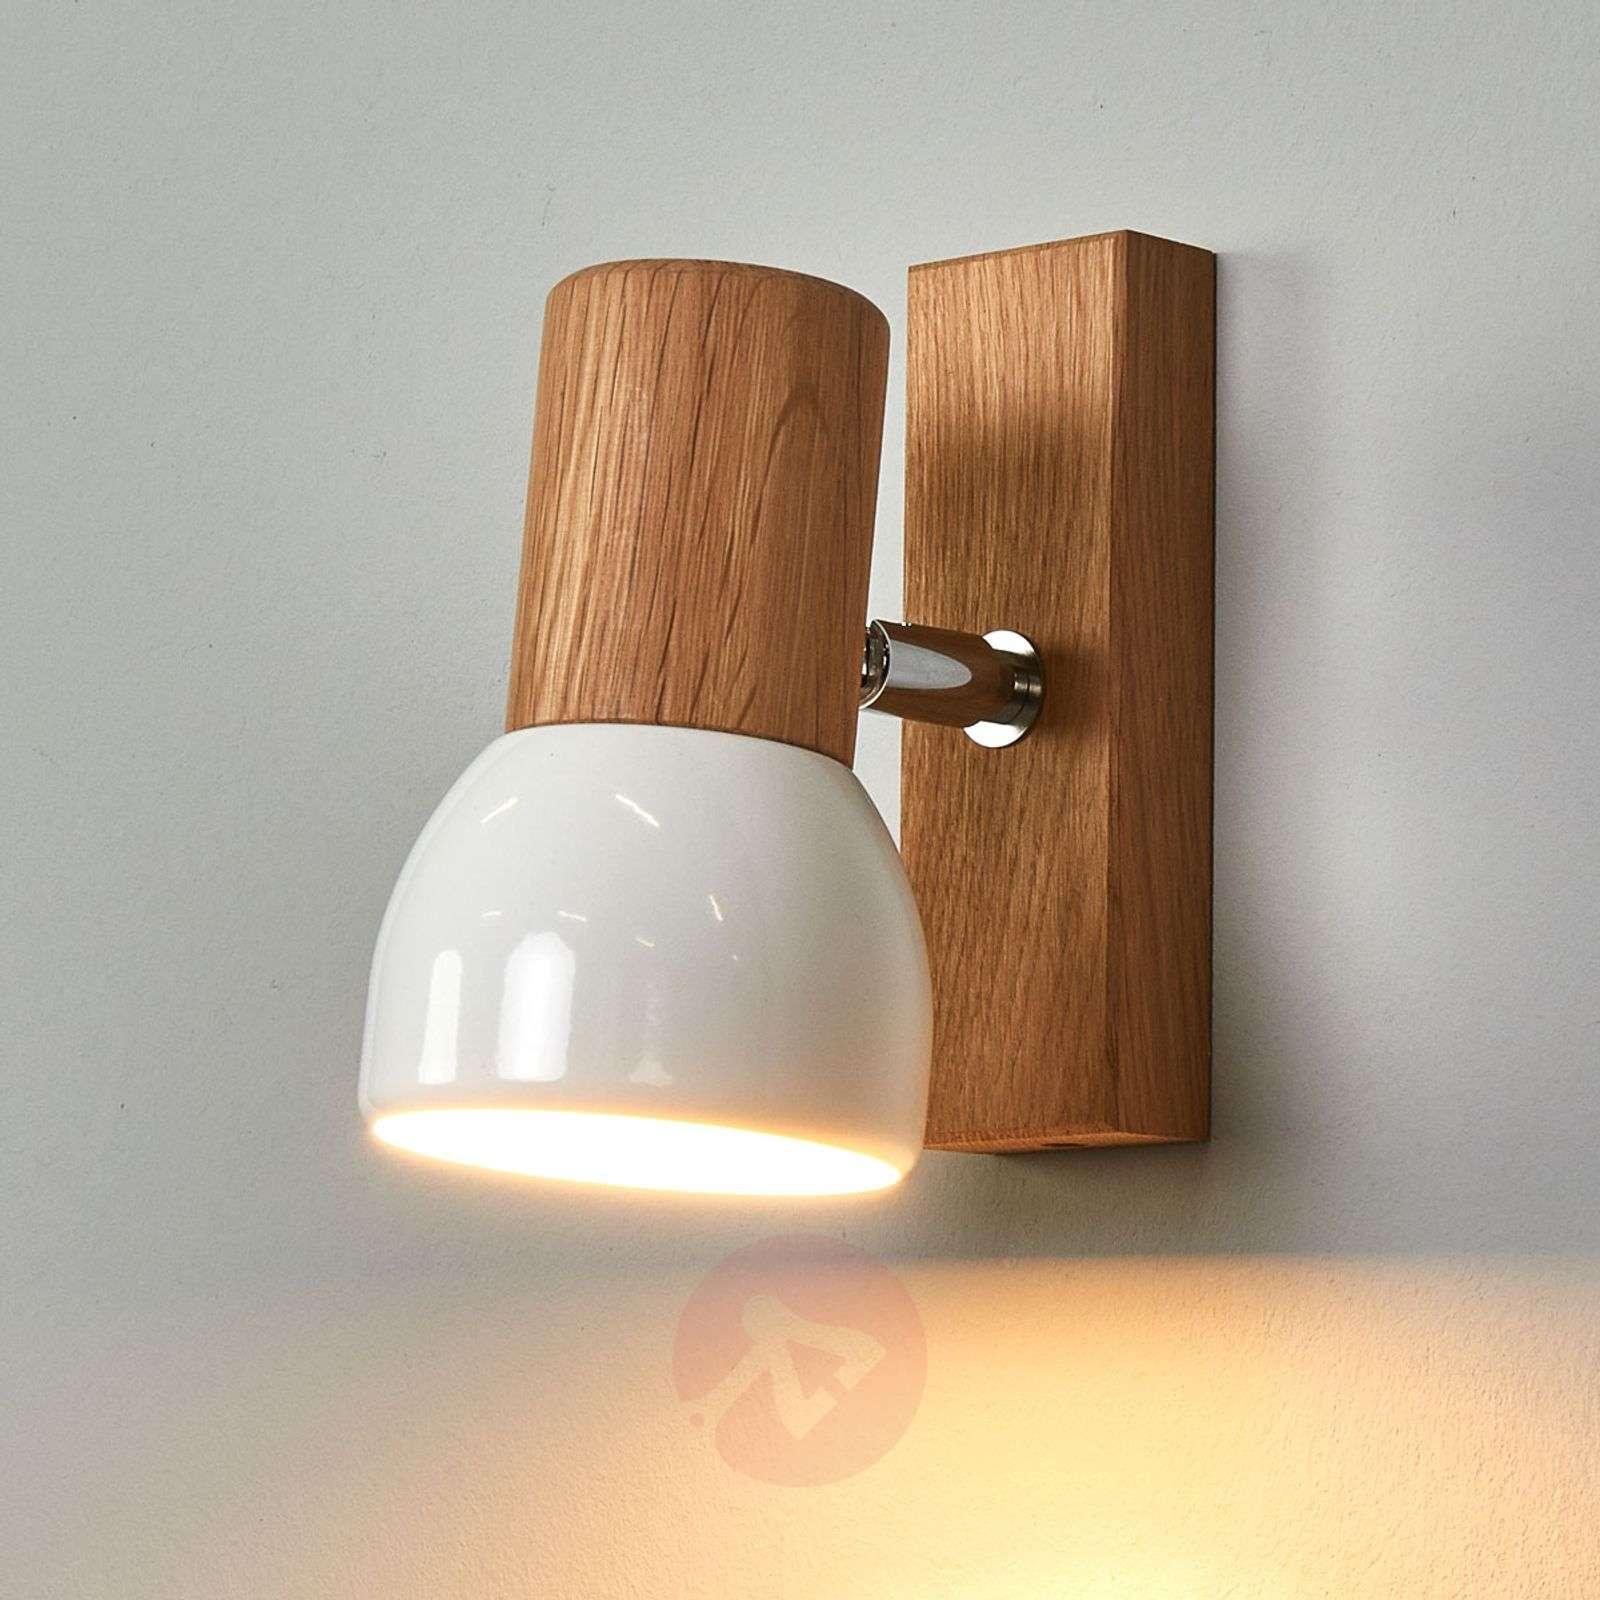 Svenda wall spotlight made of oiled oak wood-8574252-01